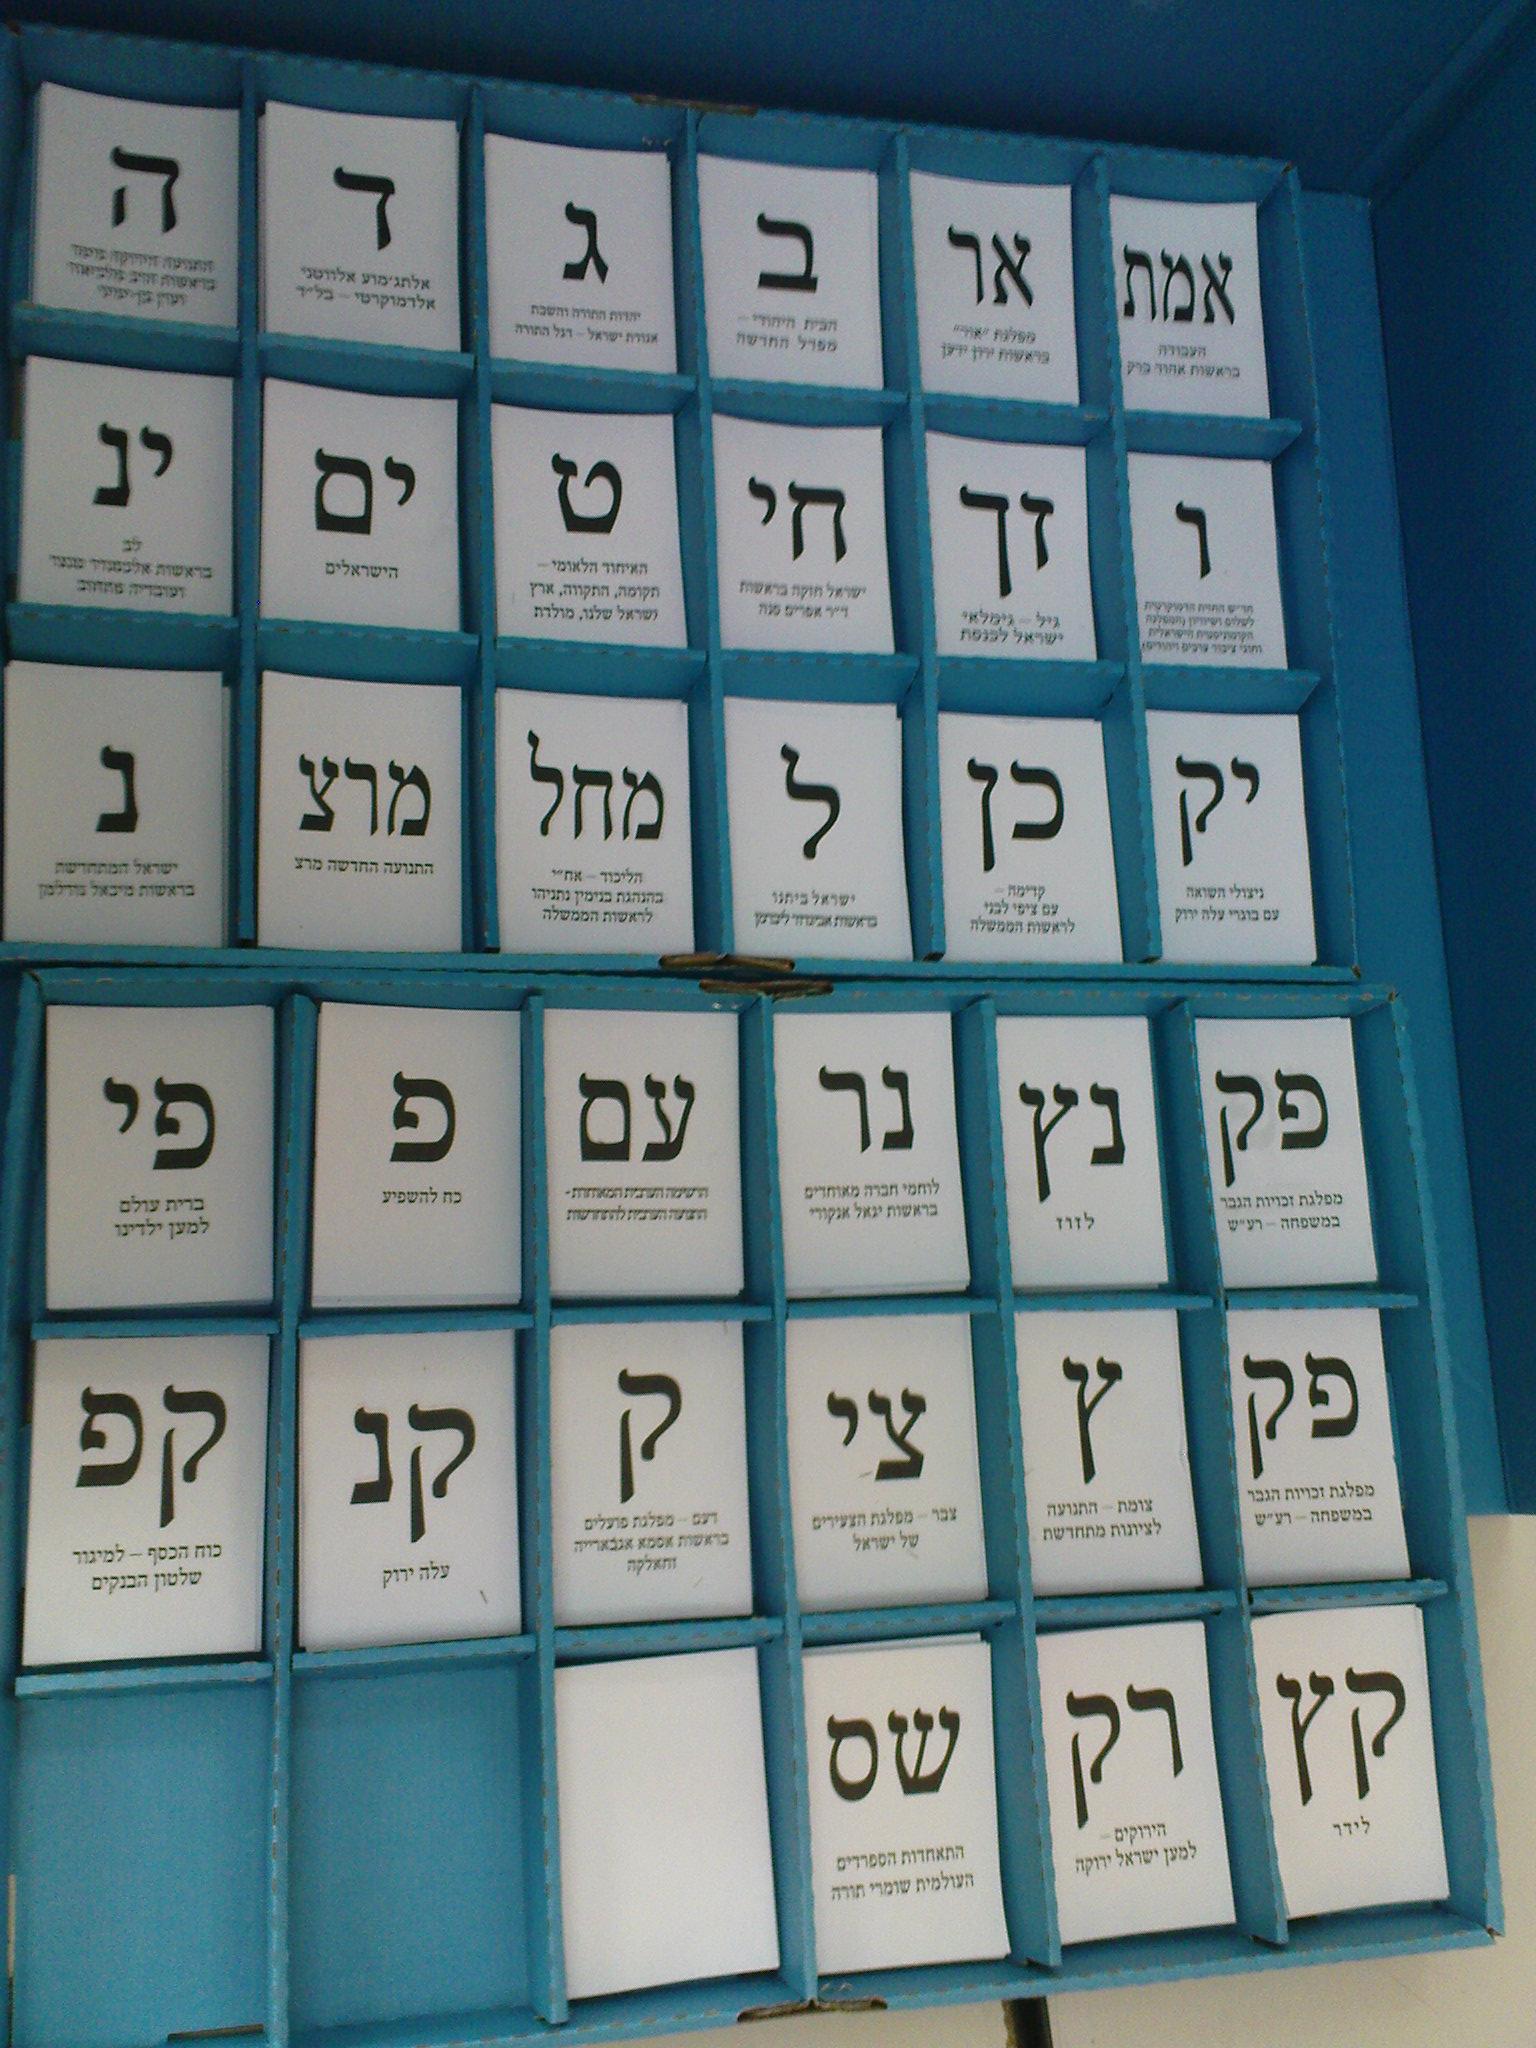 Israeli electoral system